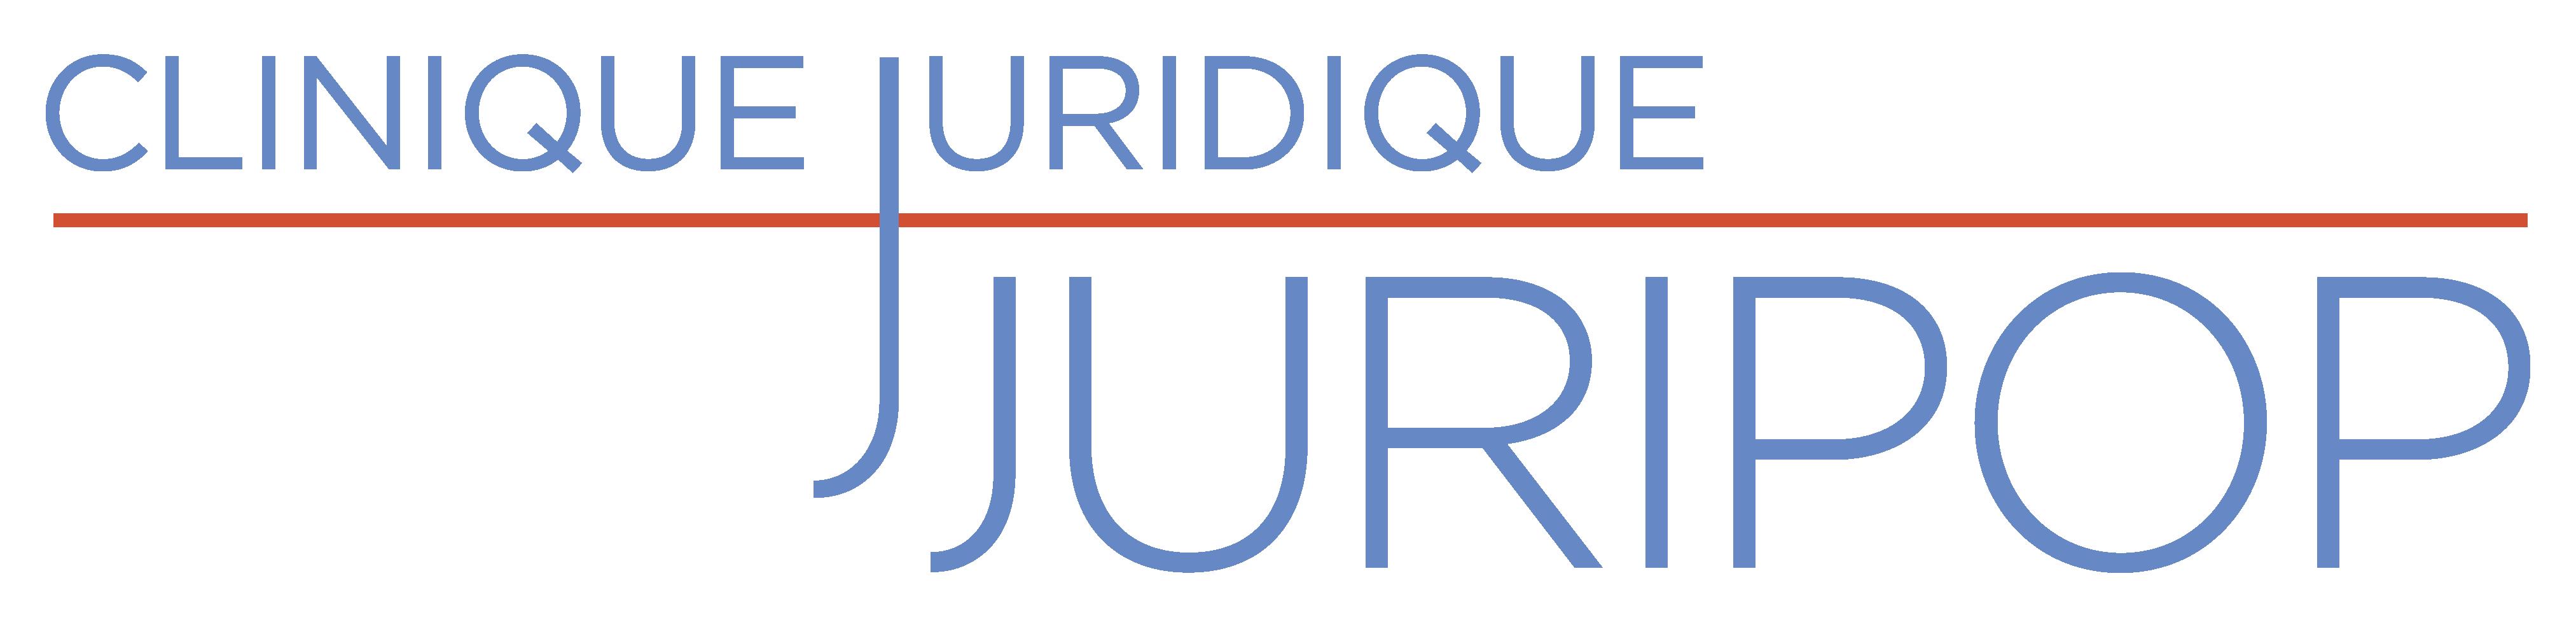 logo-clinique-juripop